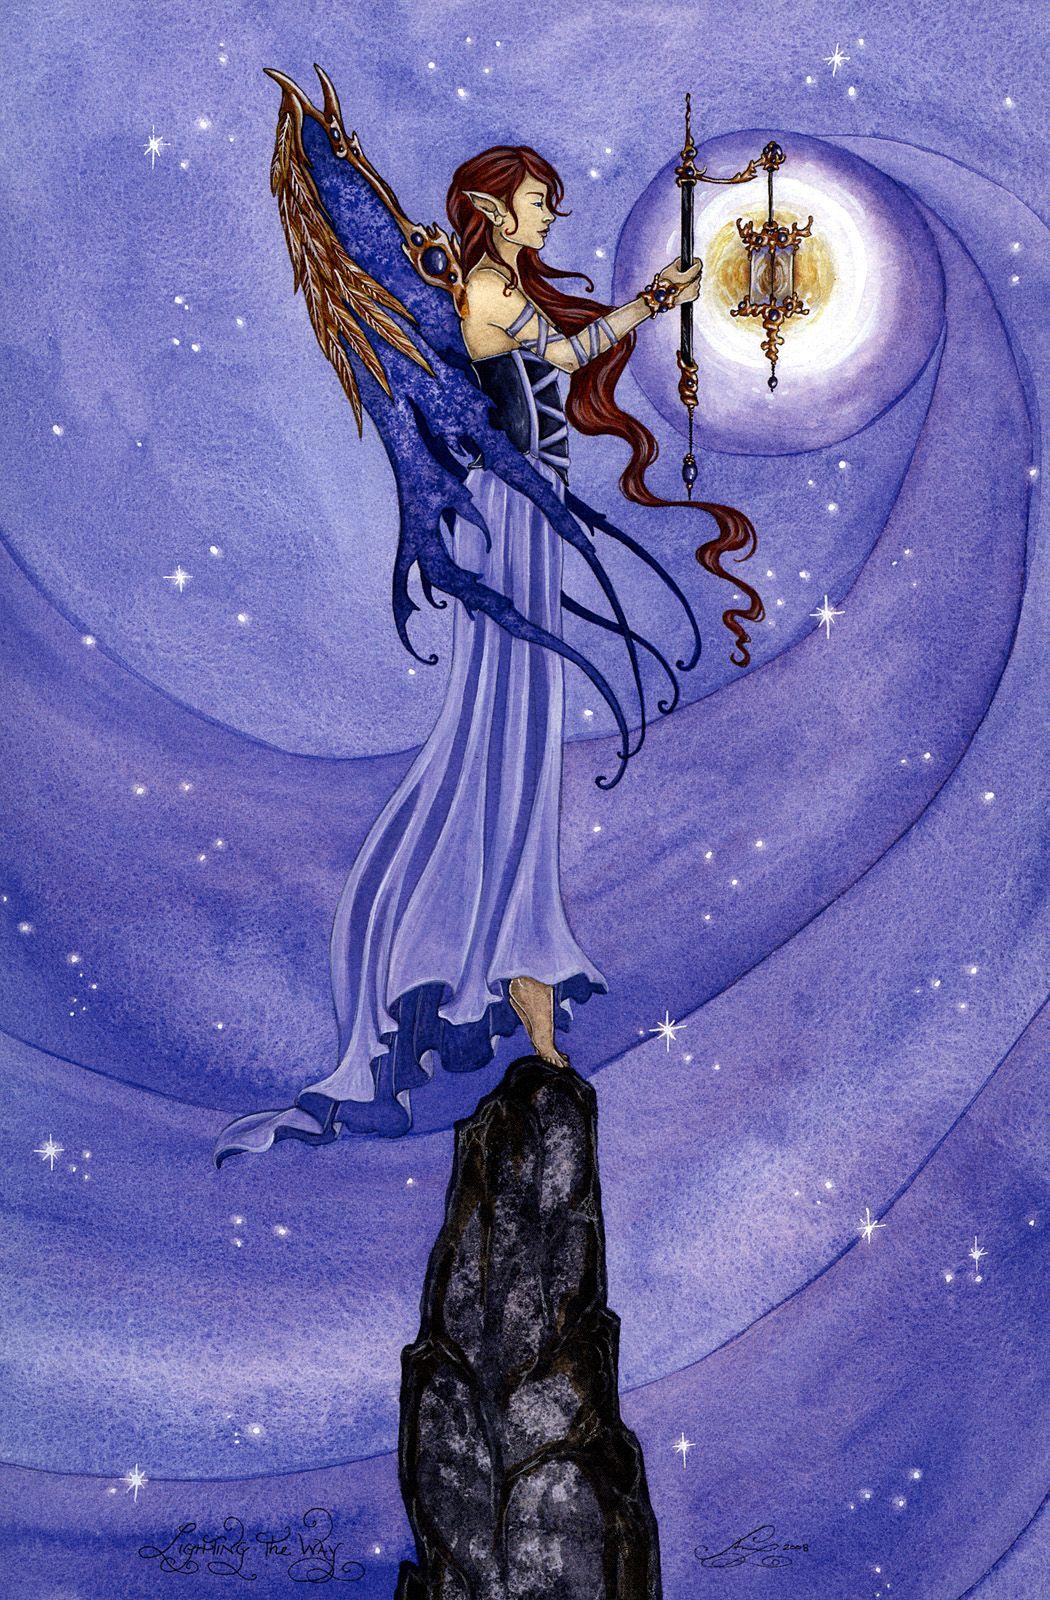 Fairy Art Amy Brown - Lighting Fairies In 2019